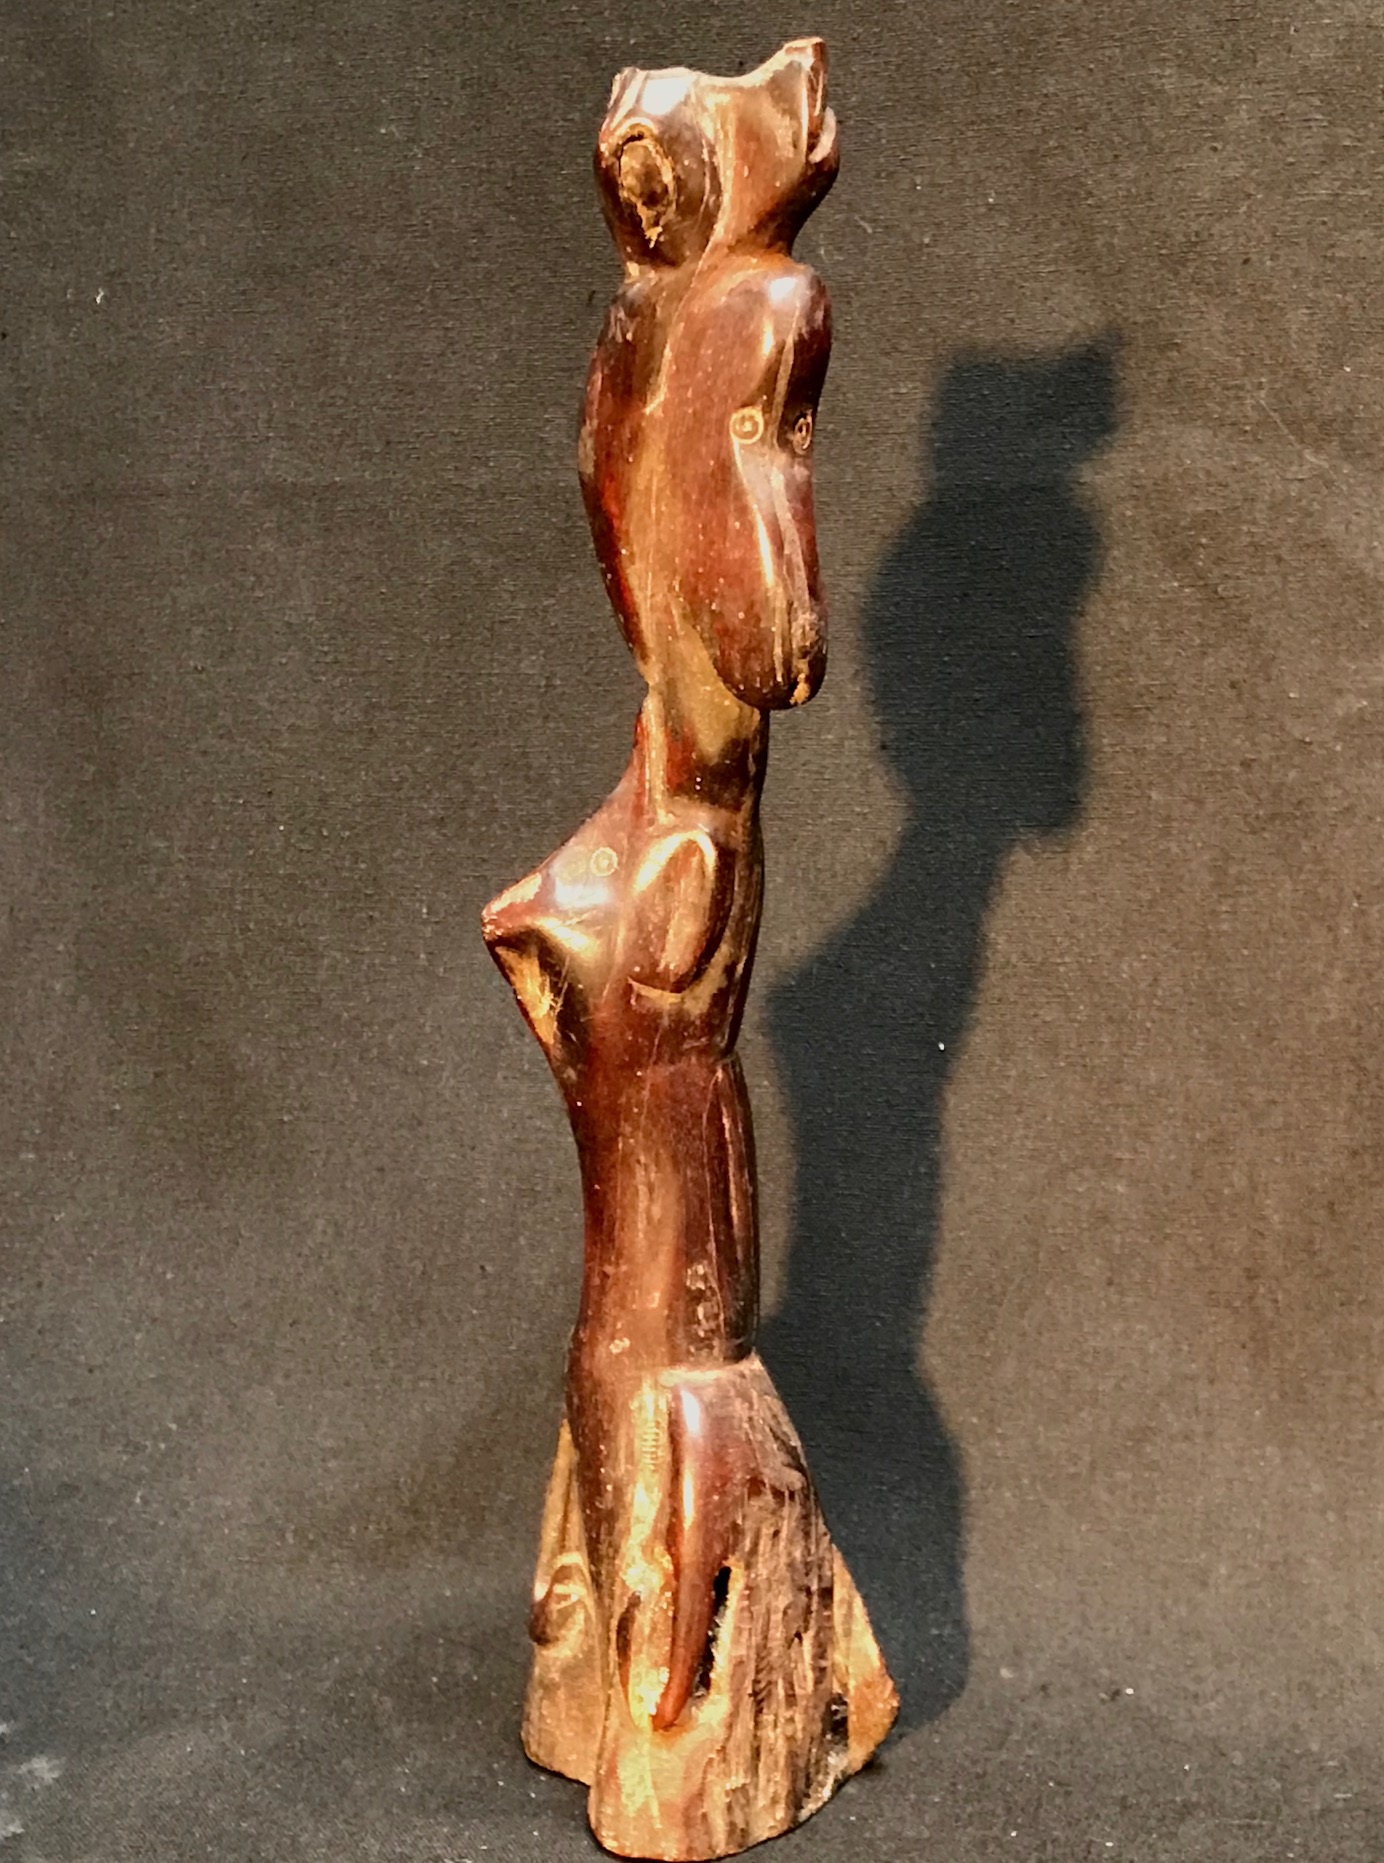 "Shaman's Power Object/Healing Wand, Cat, Horse, Dog, Bird, Sumba Island, Indonesia, Early 20th c., wood, 9 1/2"" x 2 1/4"" x 2"""